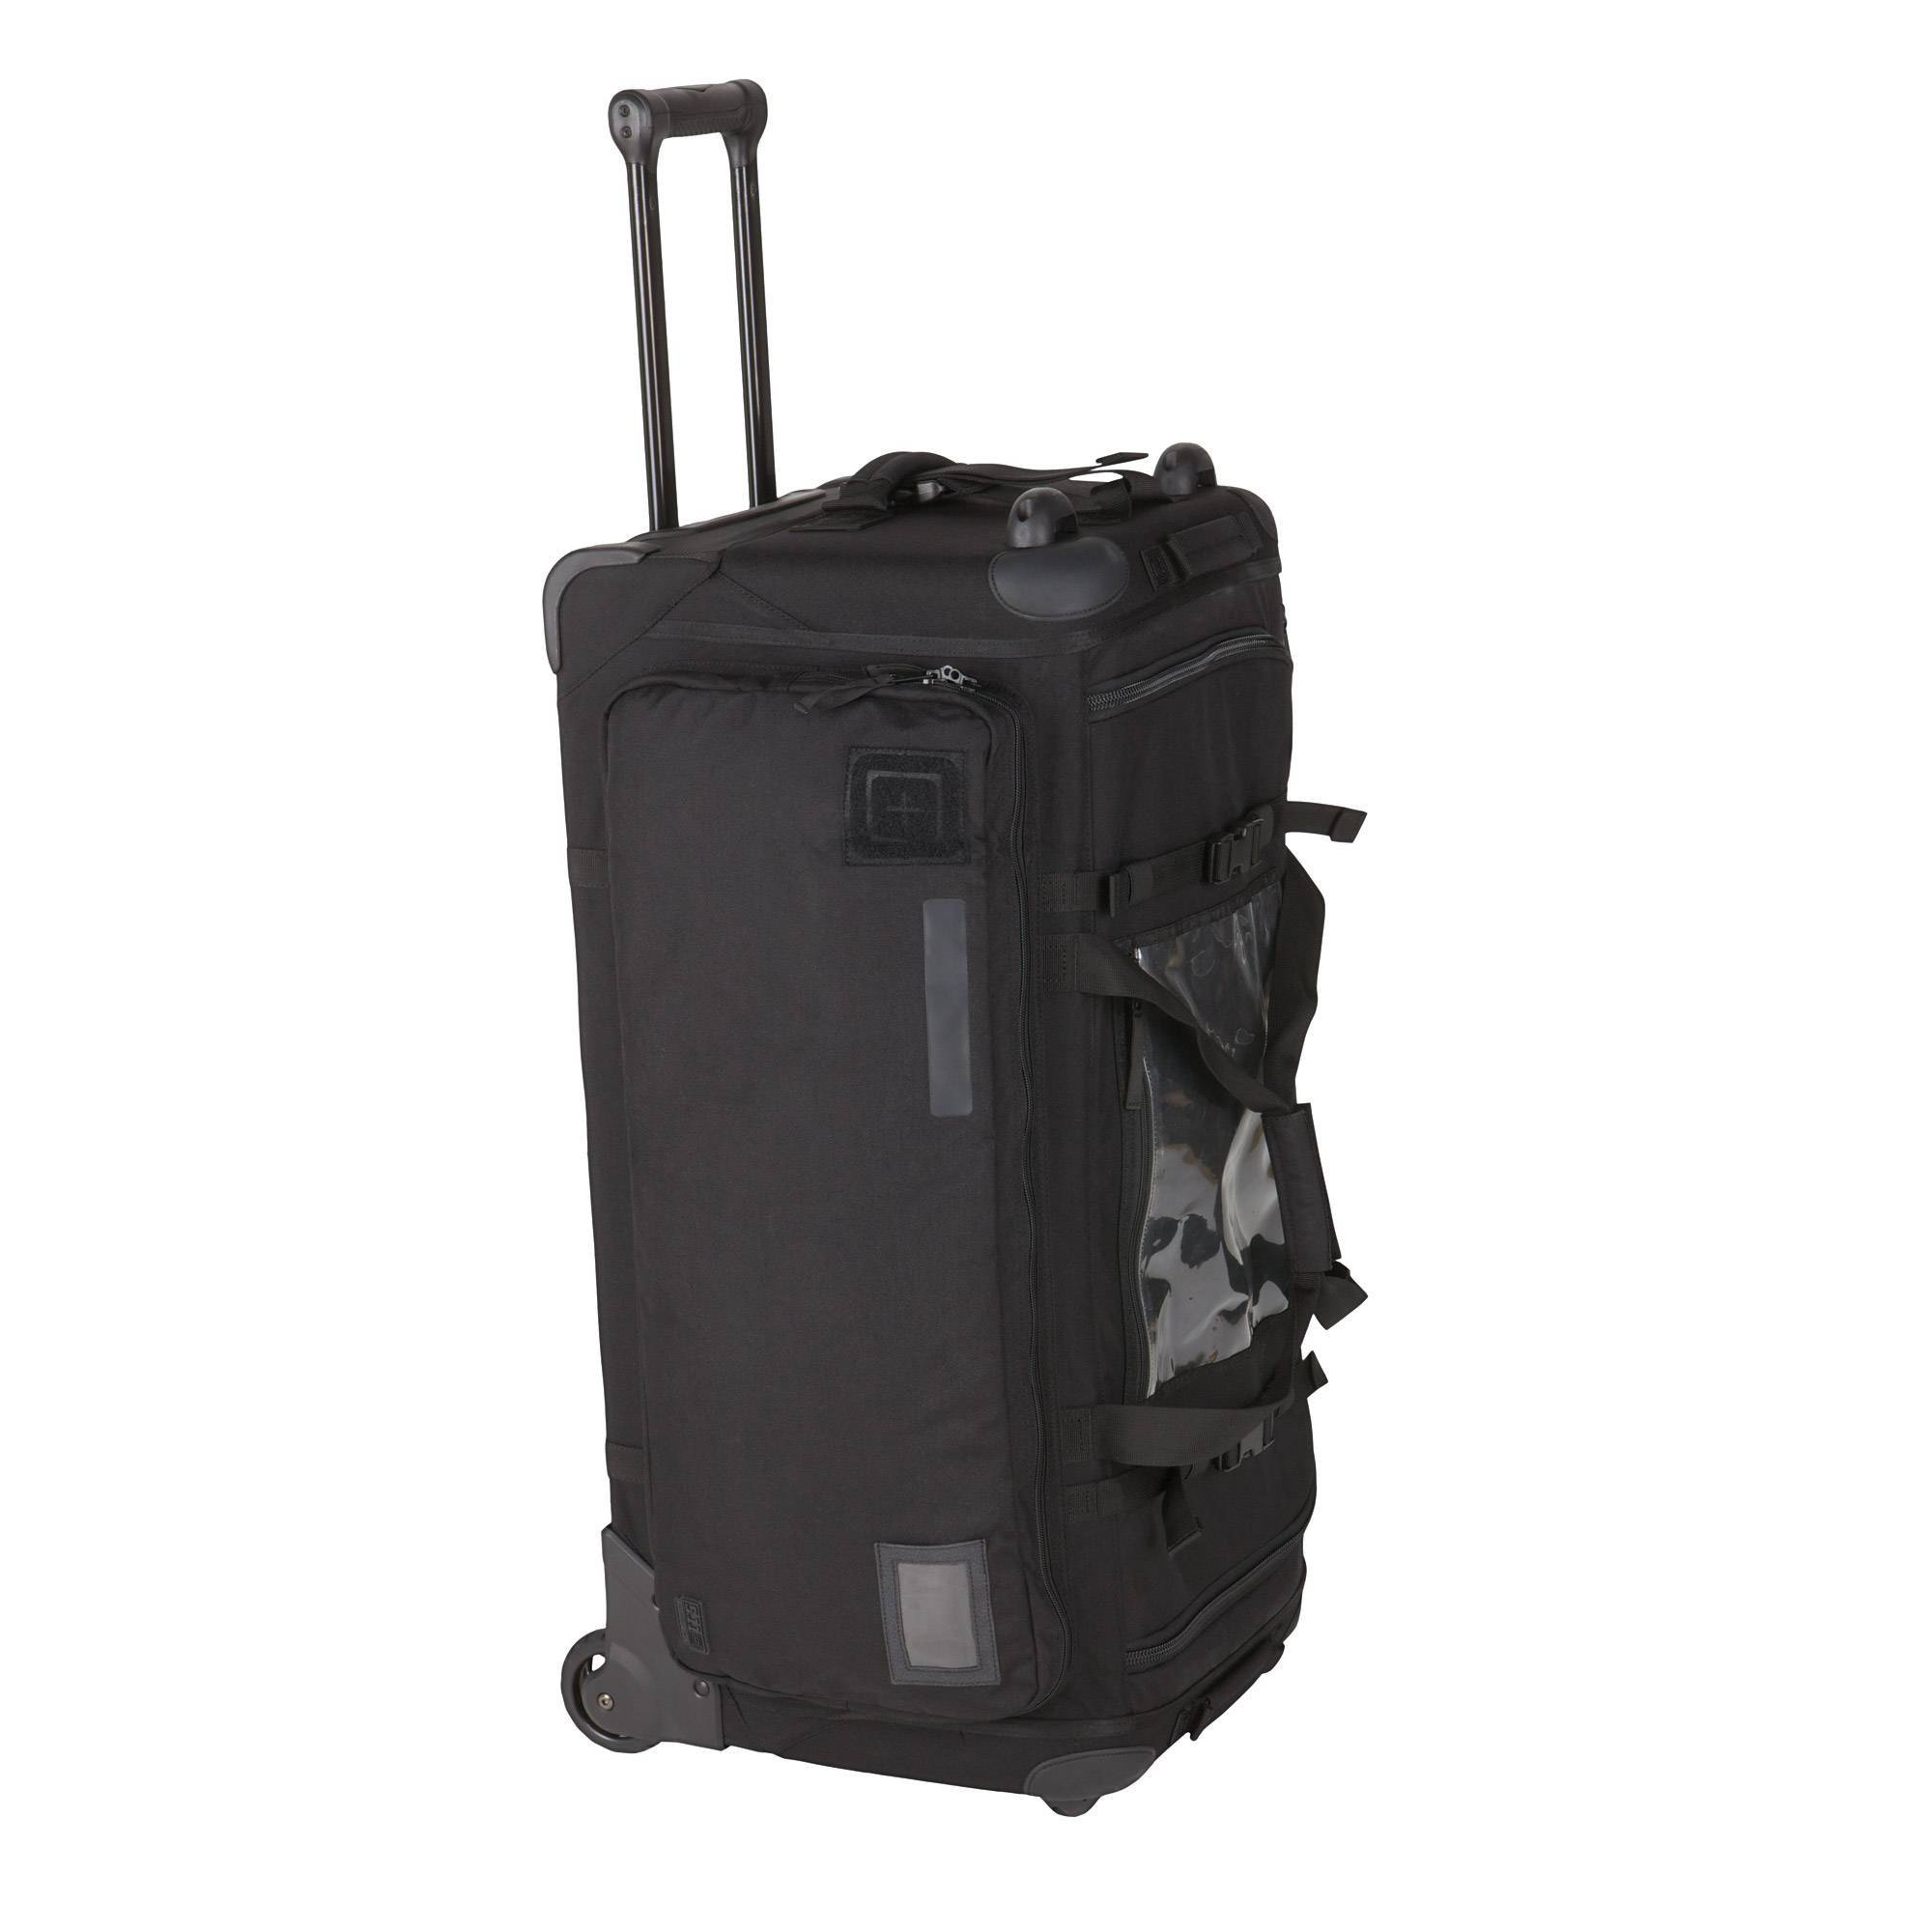 Дорожная сумка 5.11 Tactical SOMS 2.0 Black 56958-019